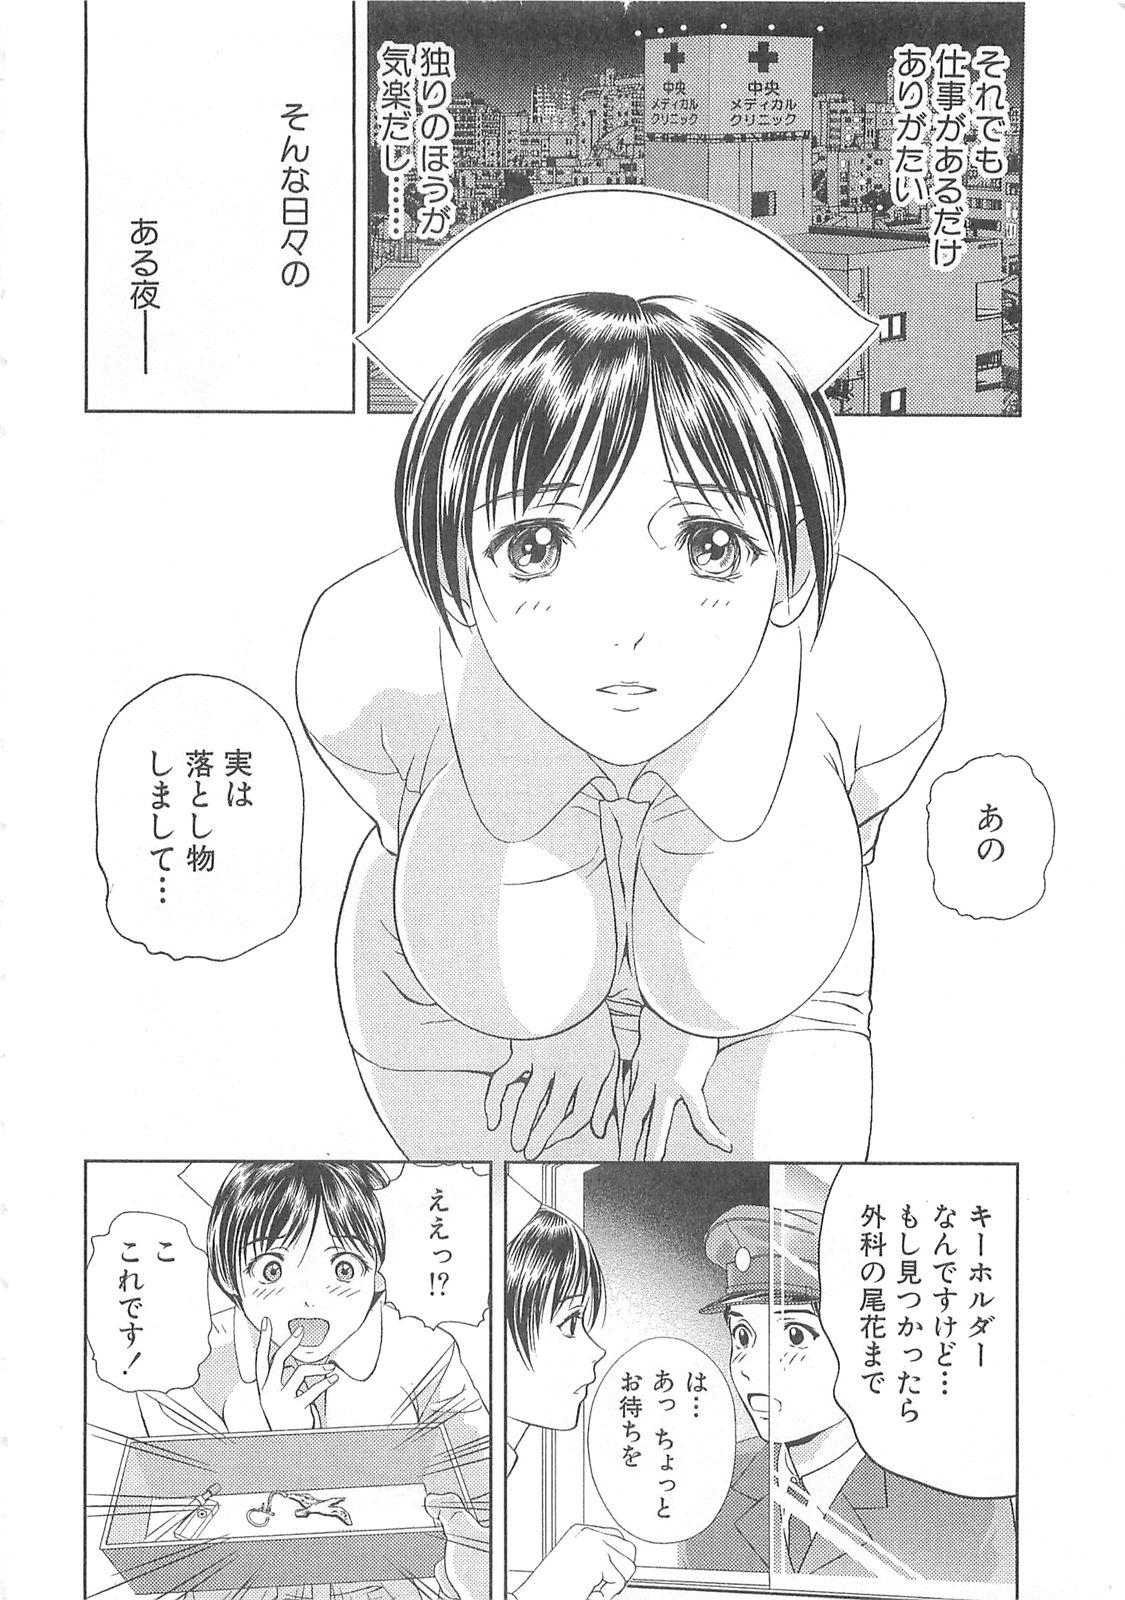 Tenshi no Kyuu - Angel's Pretty Hip 88